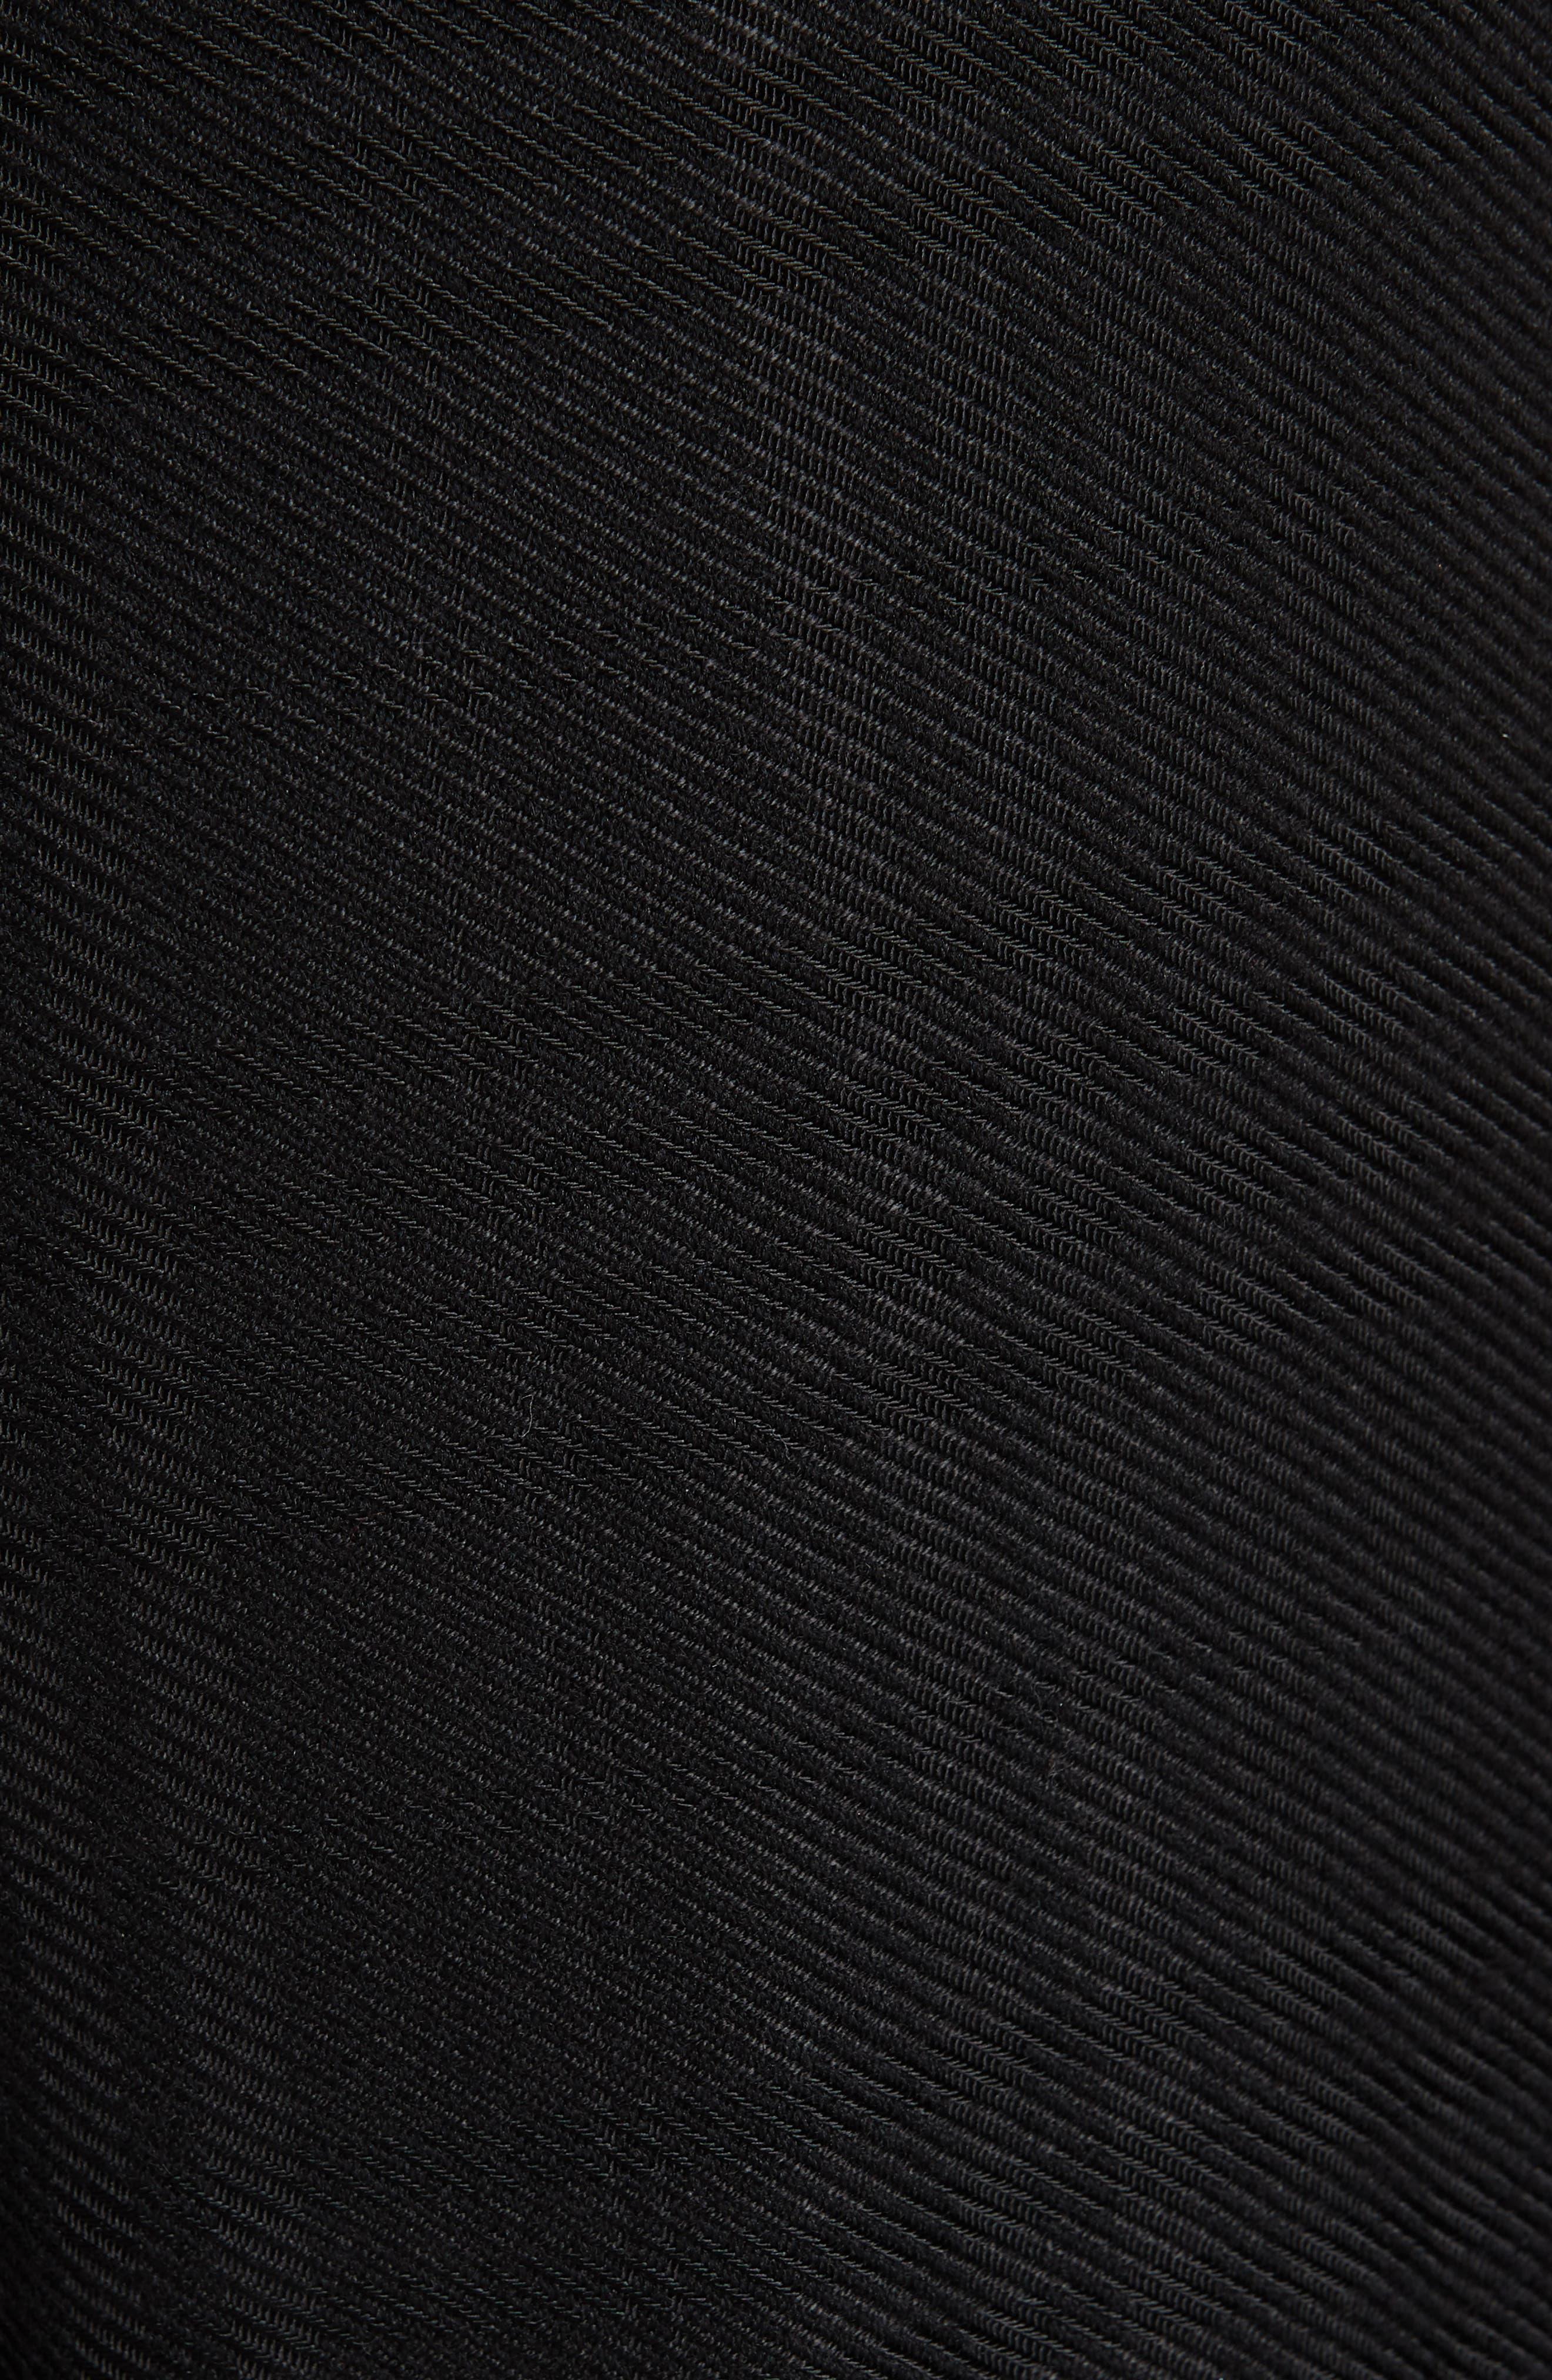 Tuli Check Button Detail Pants,                             Alternate thumbnail 5, color,                             BLACK/ BLACK